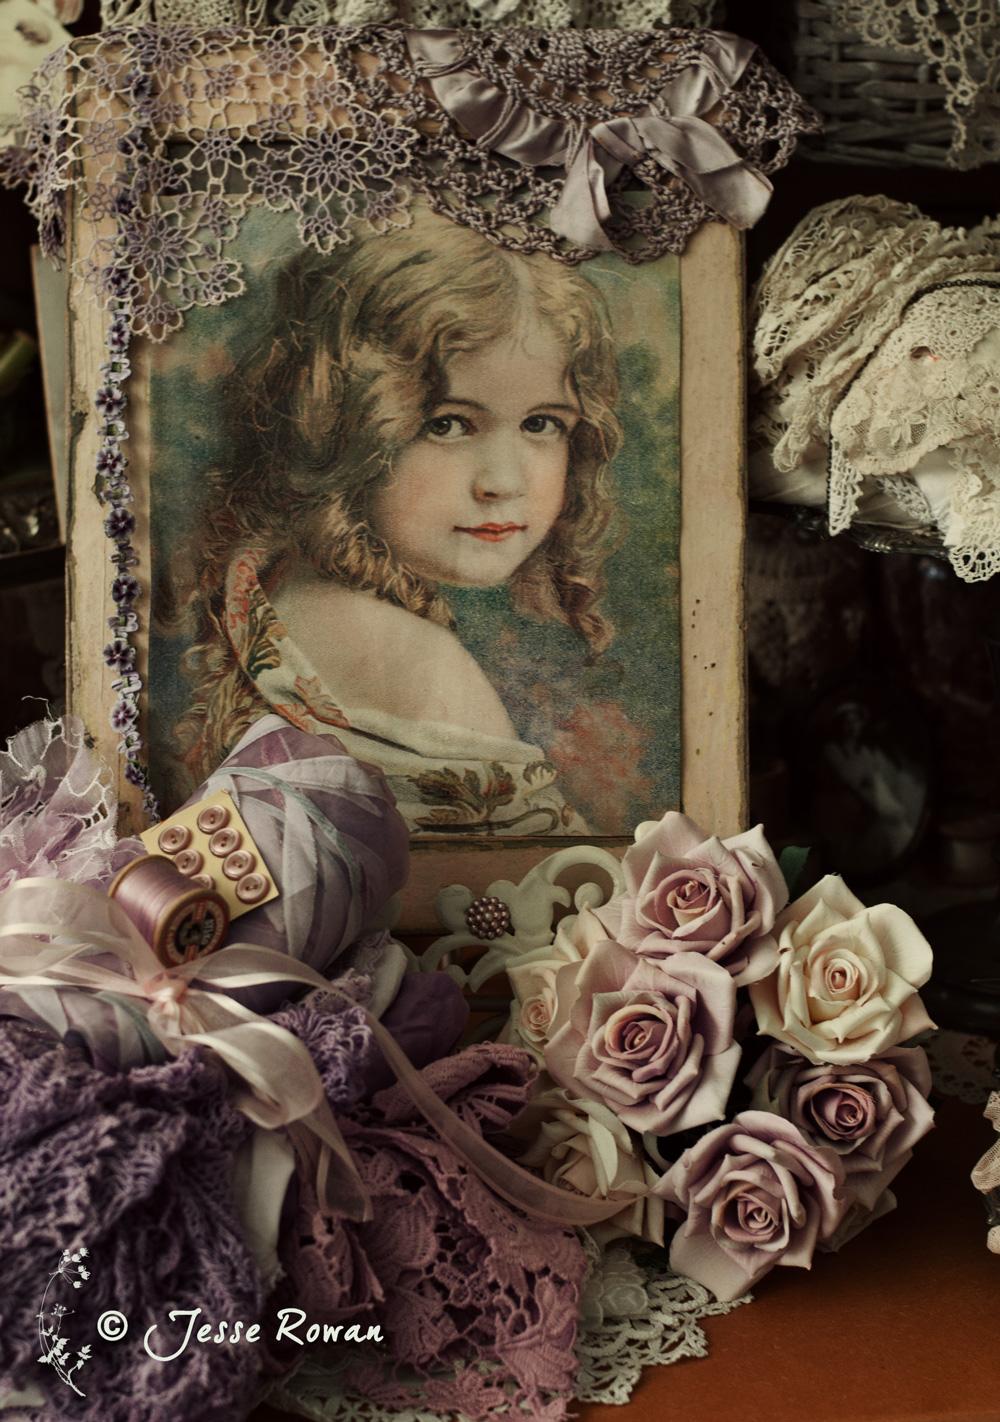 Vintage girl vignette by Jesse Rowan